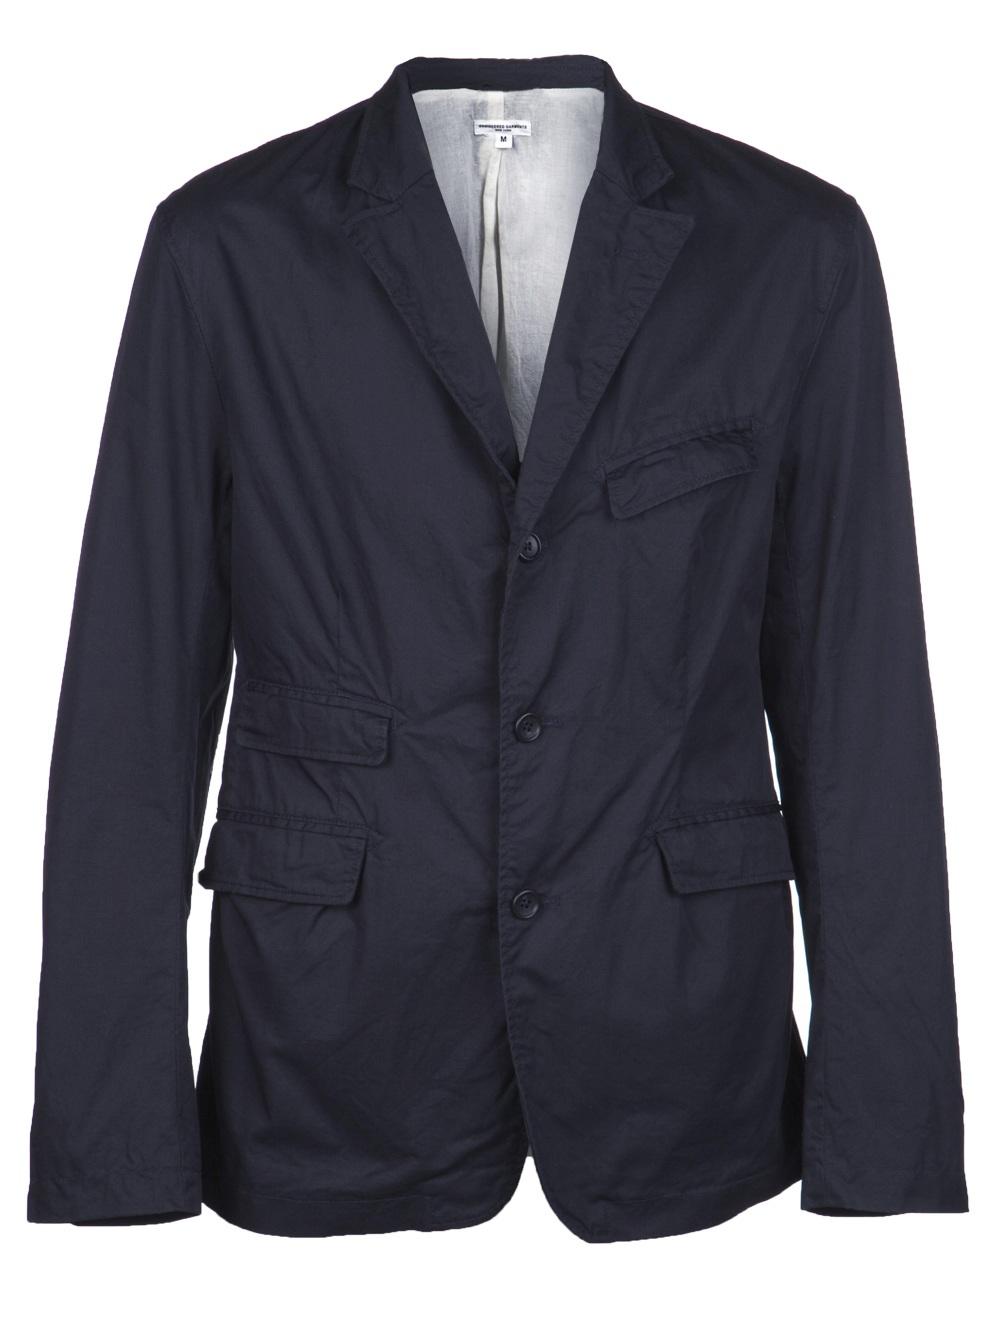 Barbour Sapper Jacket >> Engineered Garments Andover Jacket in Blue for Men - Lyst